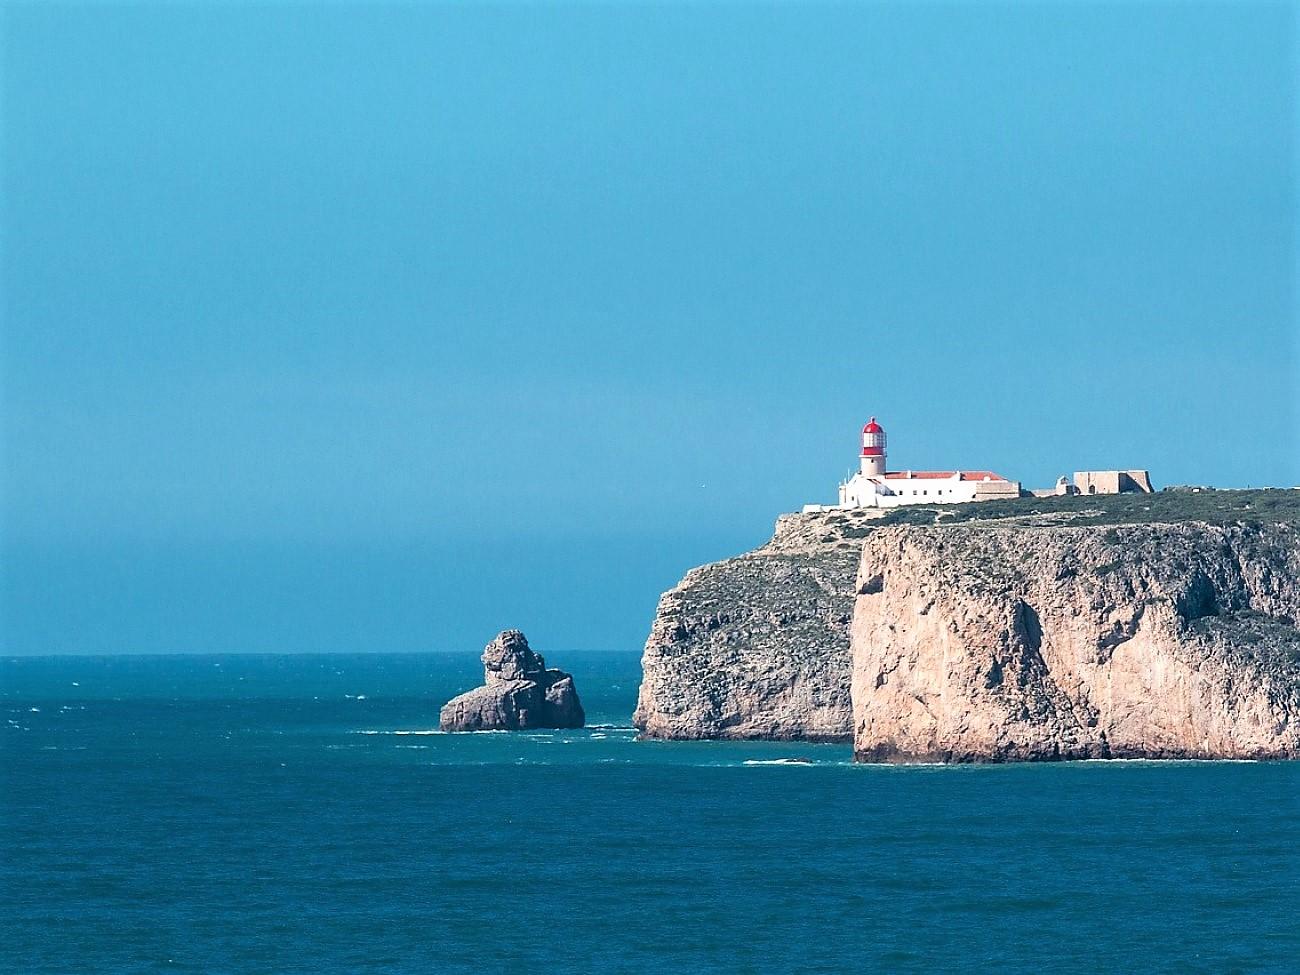 Cabo São Vicente, Sagres, Algarve, Portugal